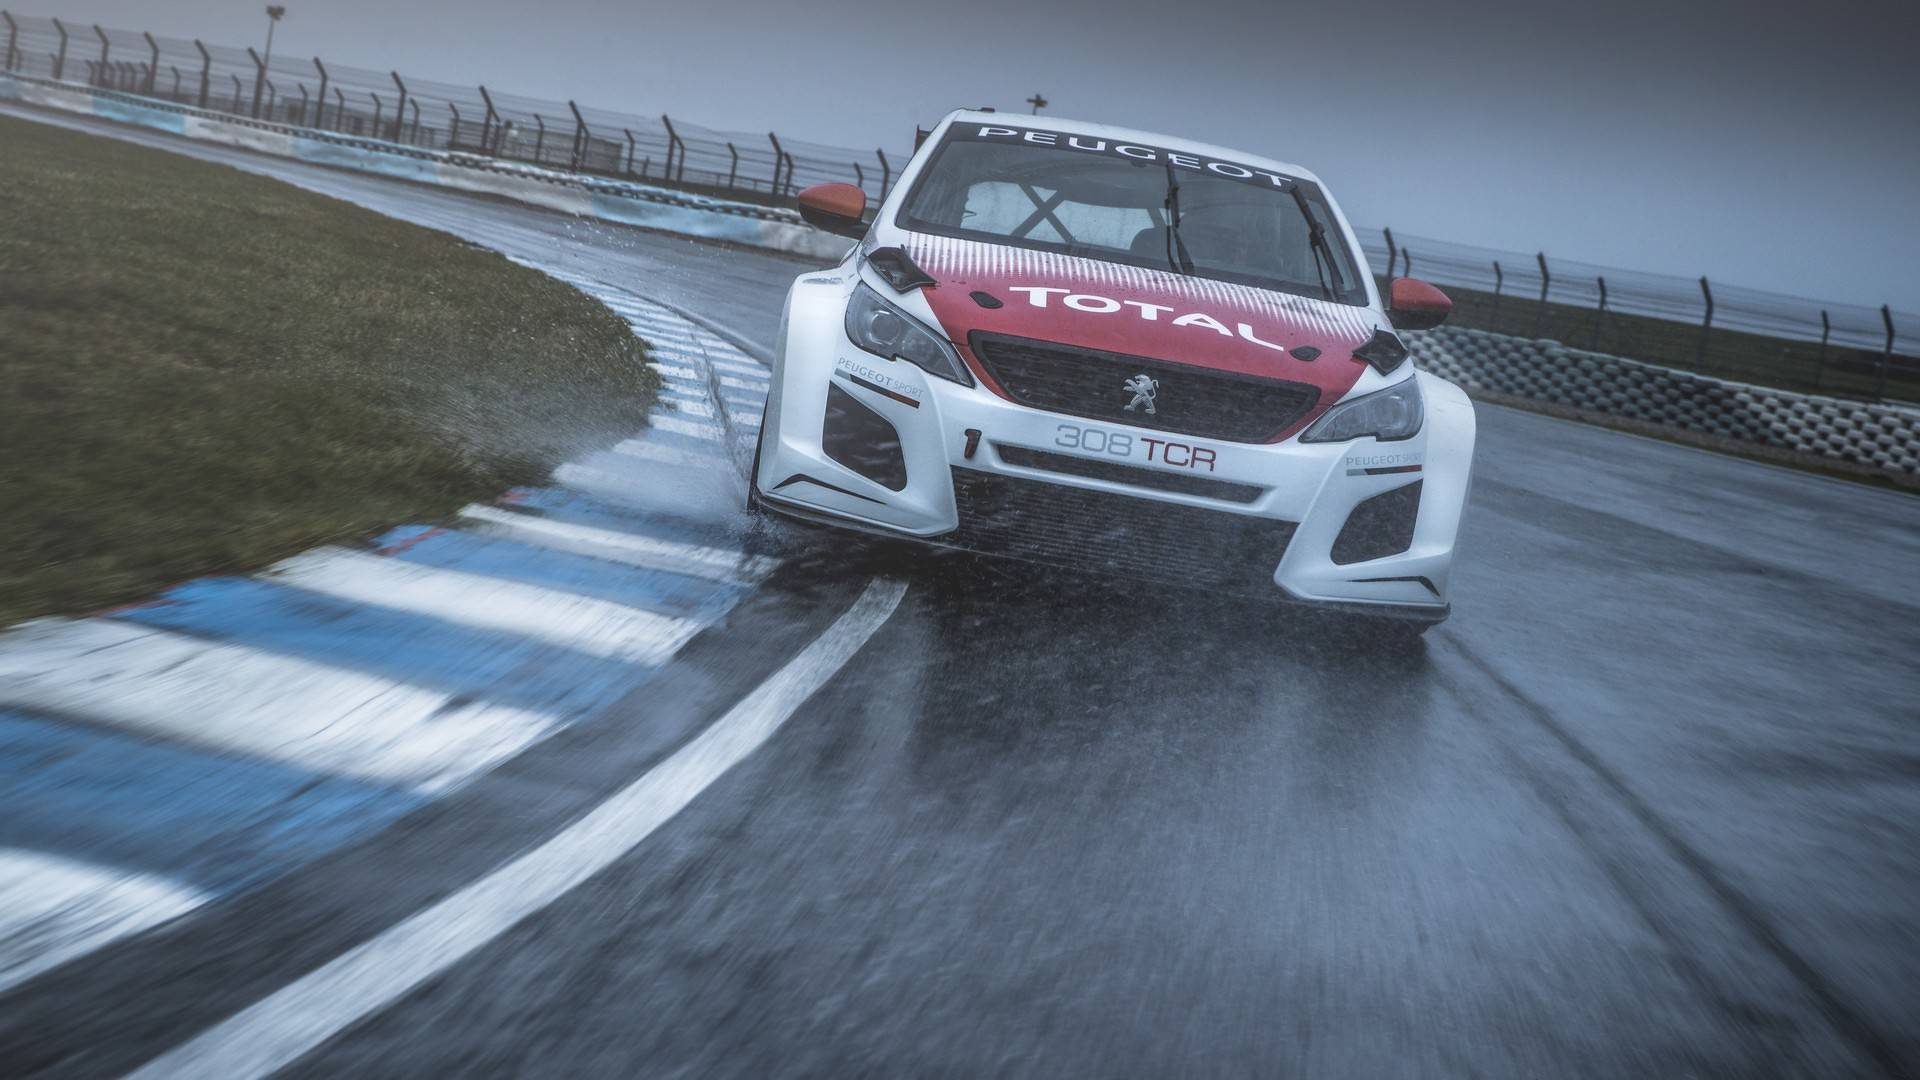 Peugeot 308 TCR 2018 (1)